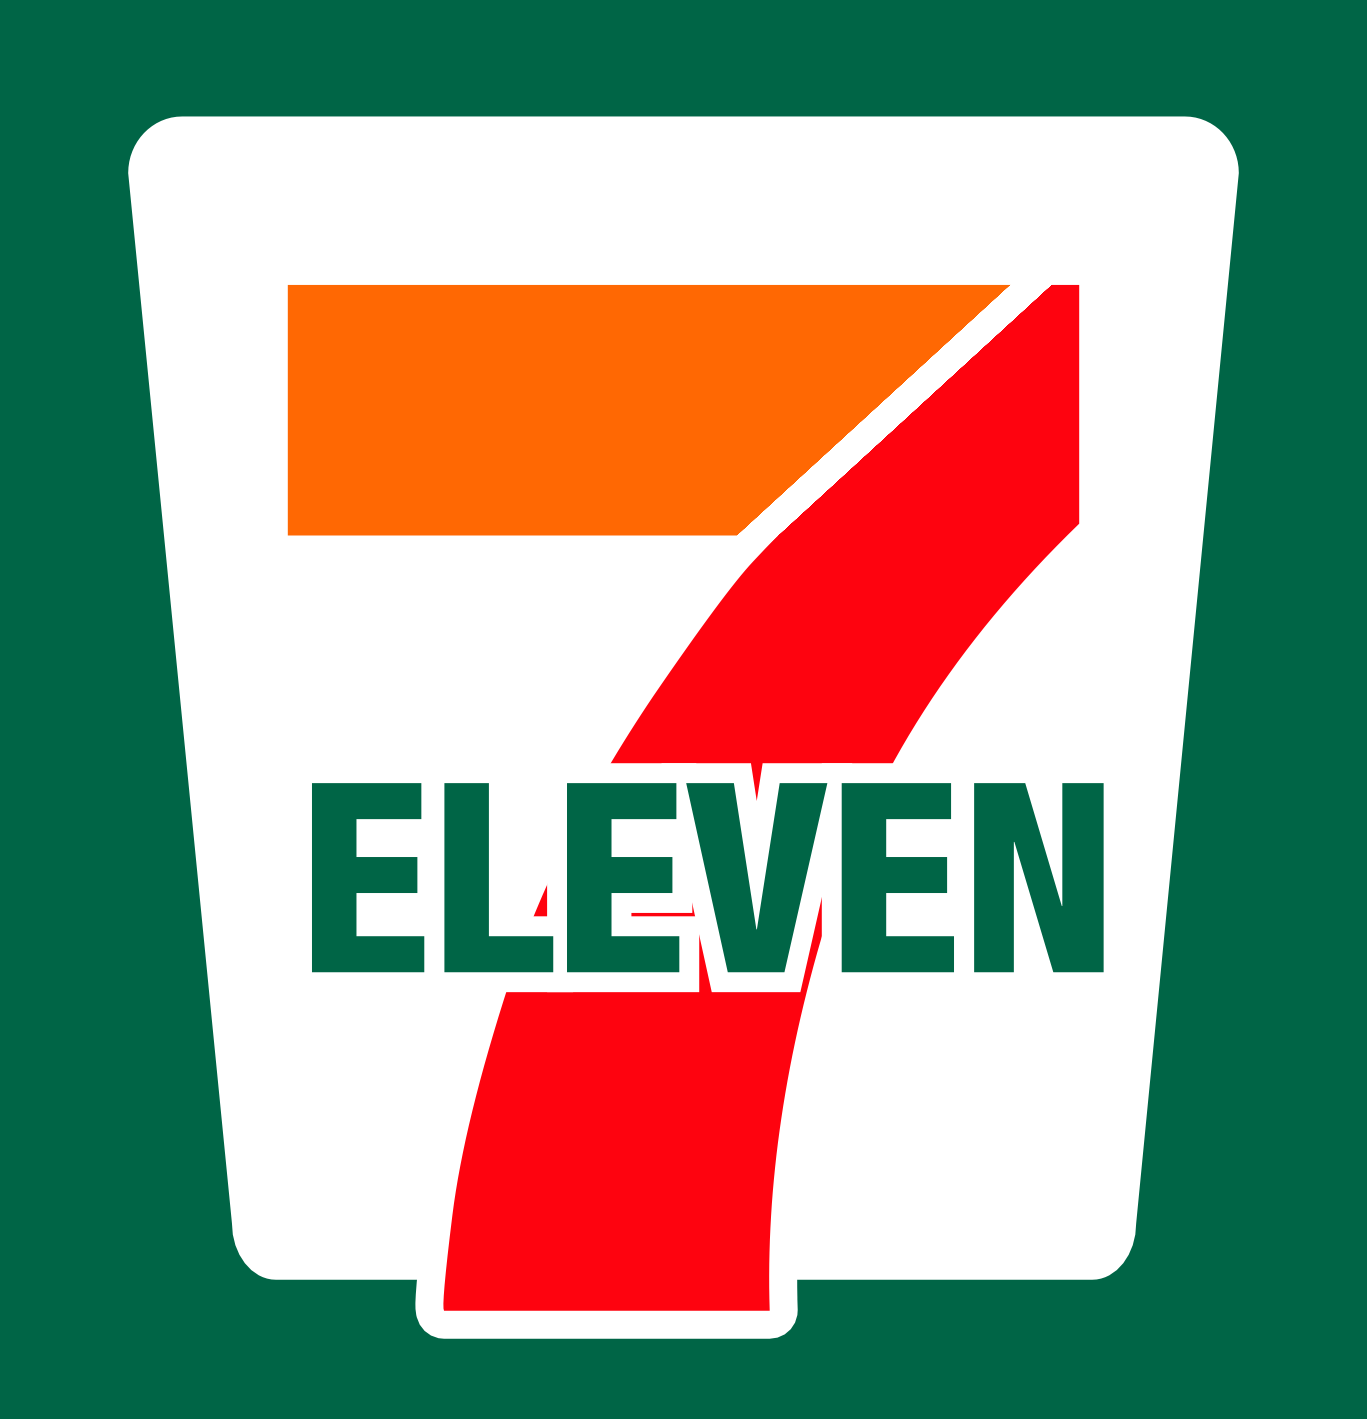 7-Eleven-Logos-PNG-Vector.png